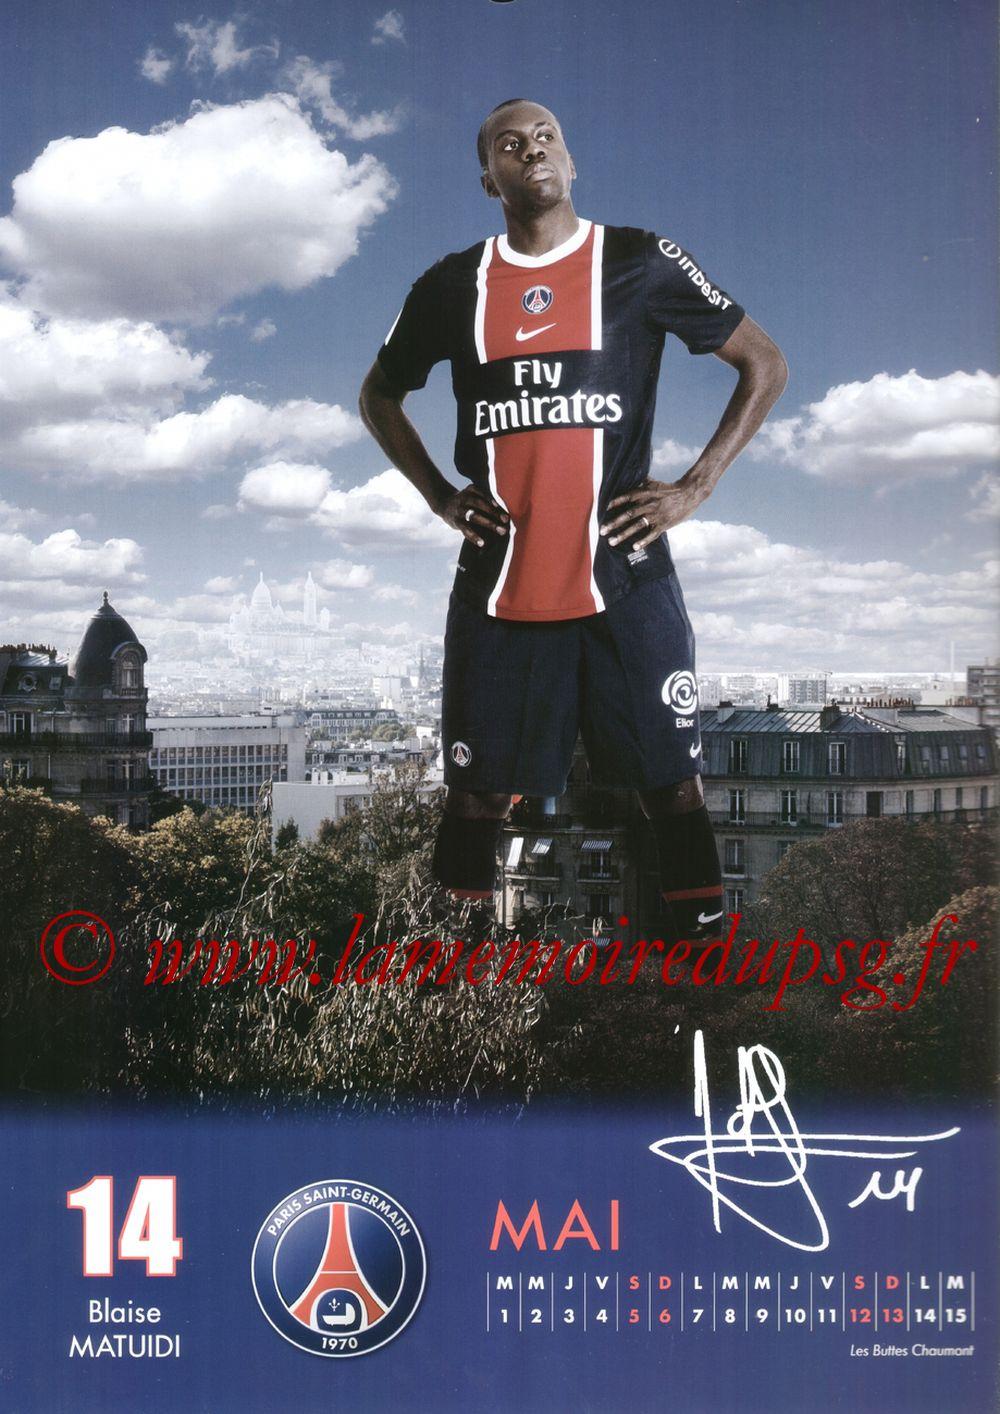 Calendrier PSG 2012 - Page 09 - Blaise MATUIDI